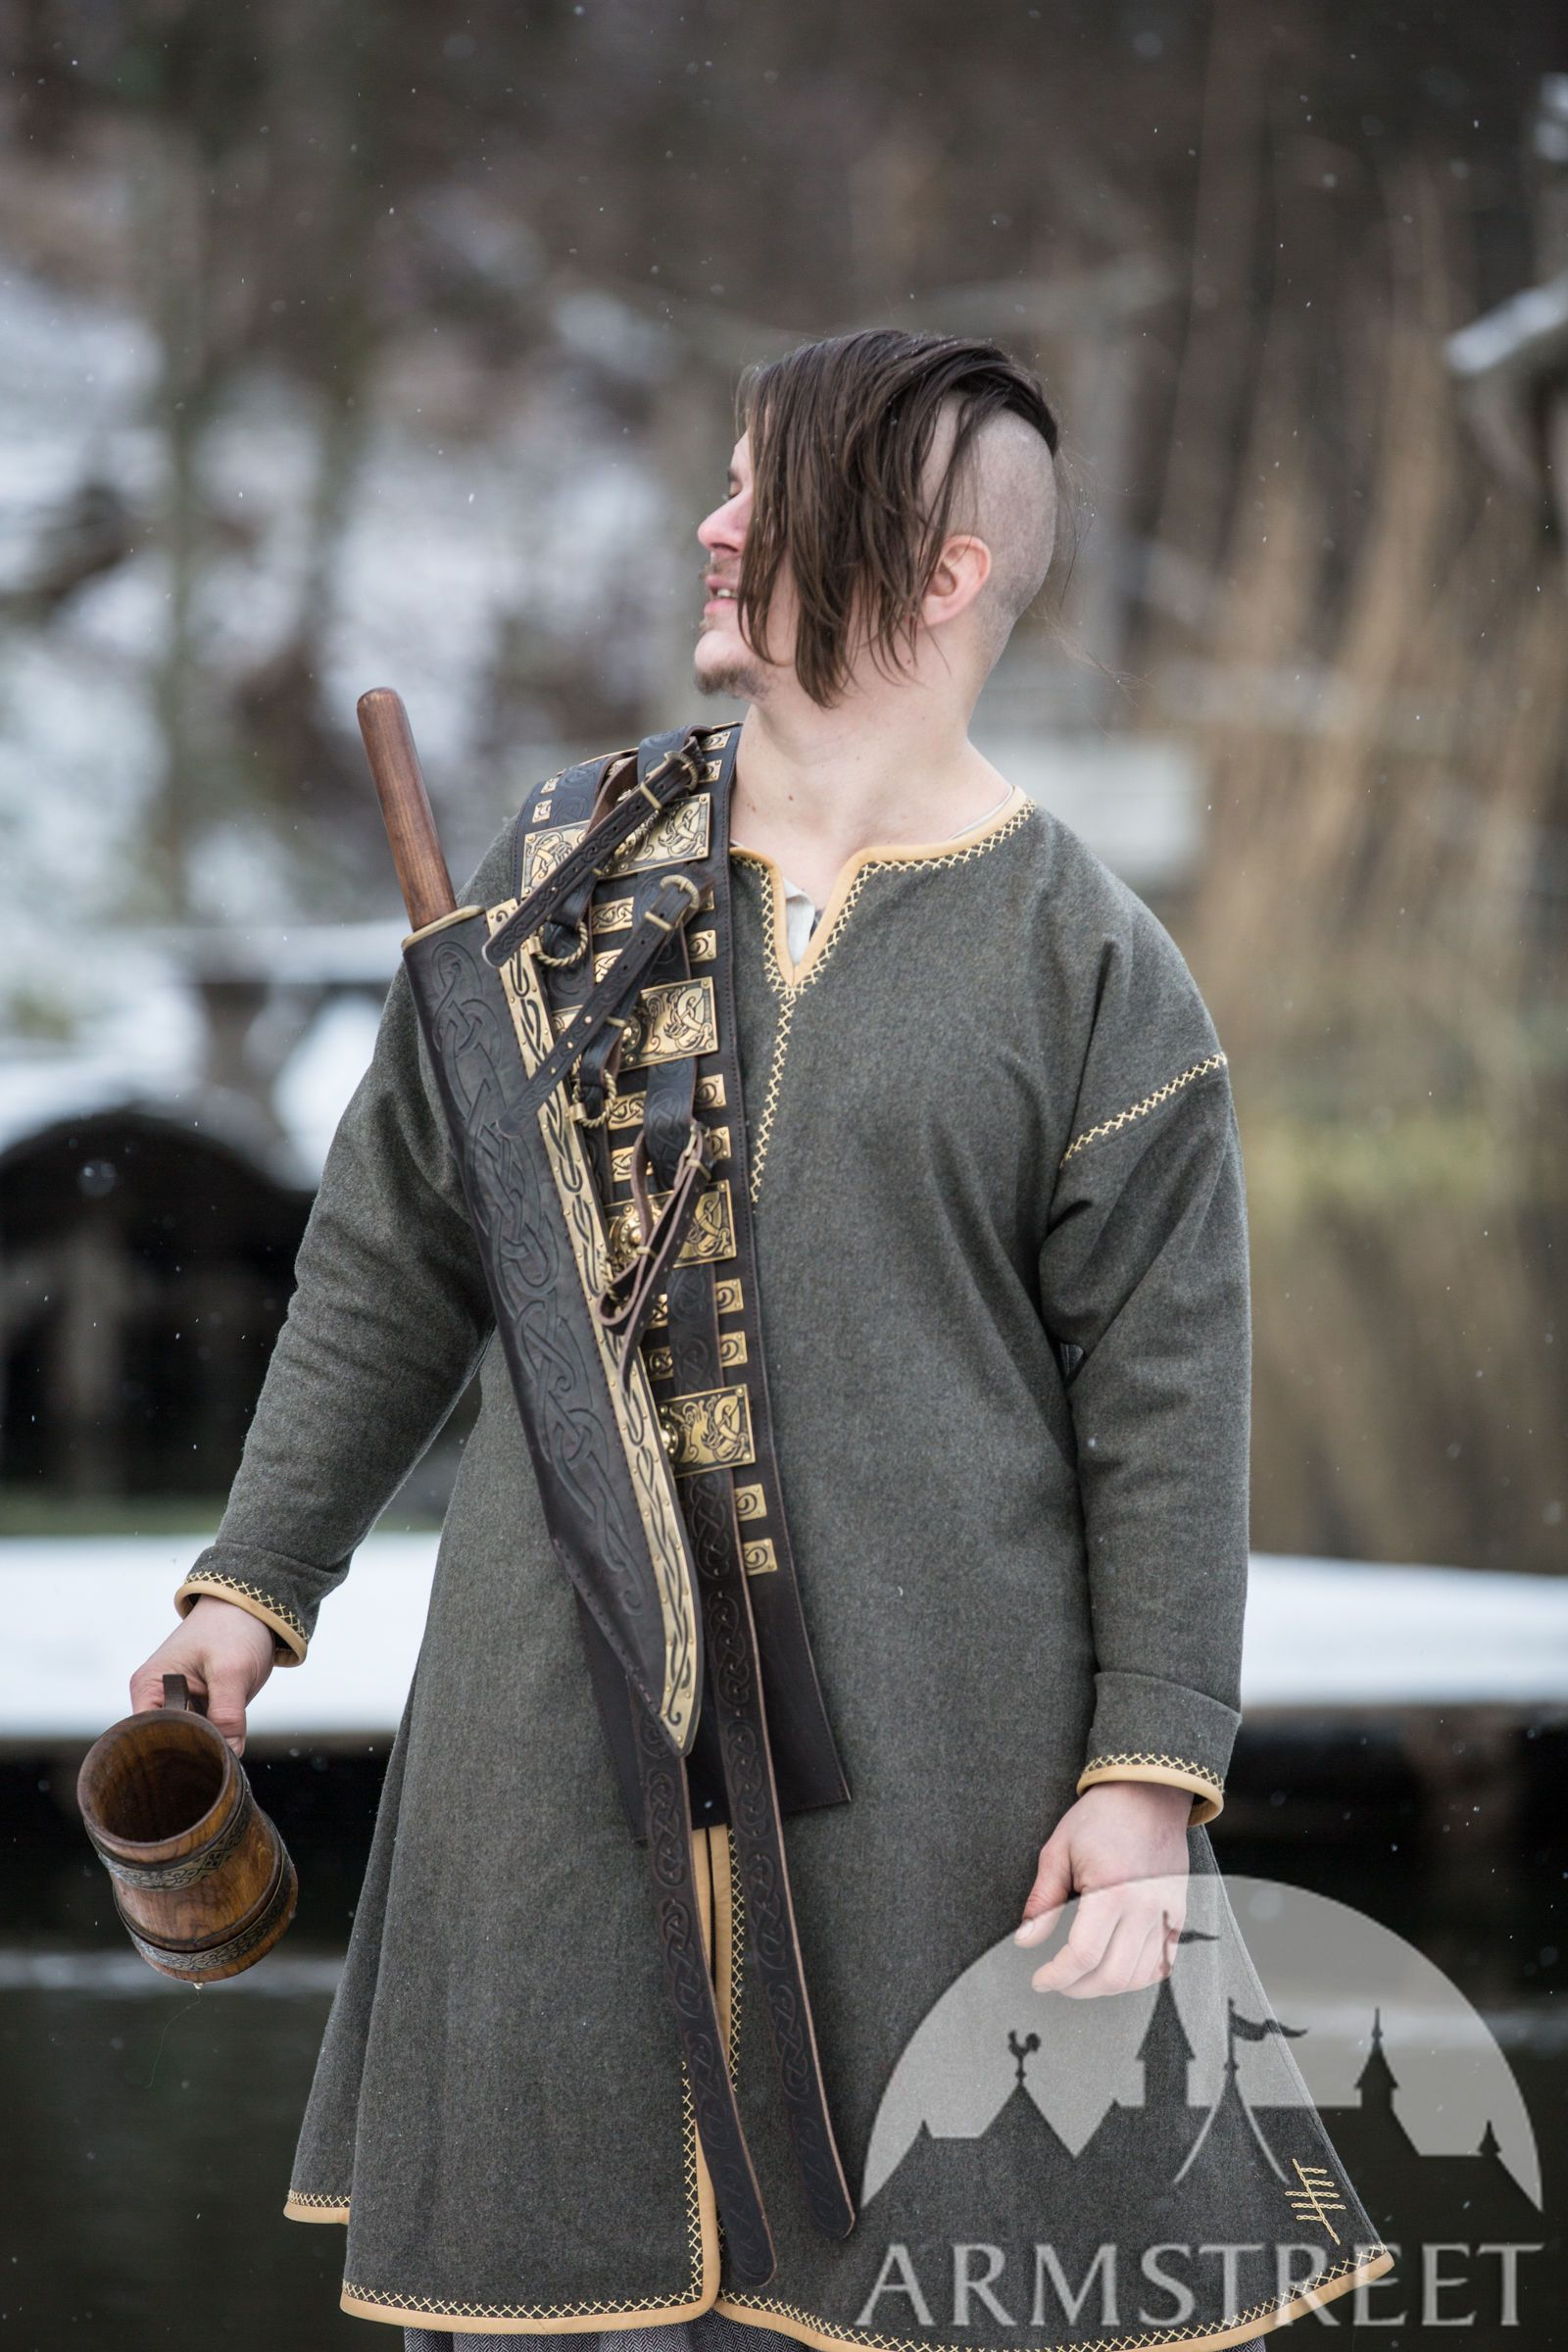 Viking Decorative Seax With Scabbard Olegg The Mercenary